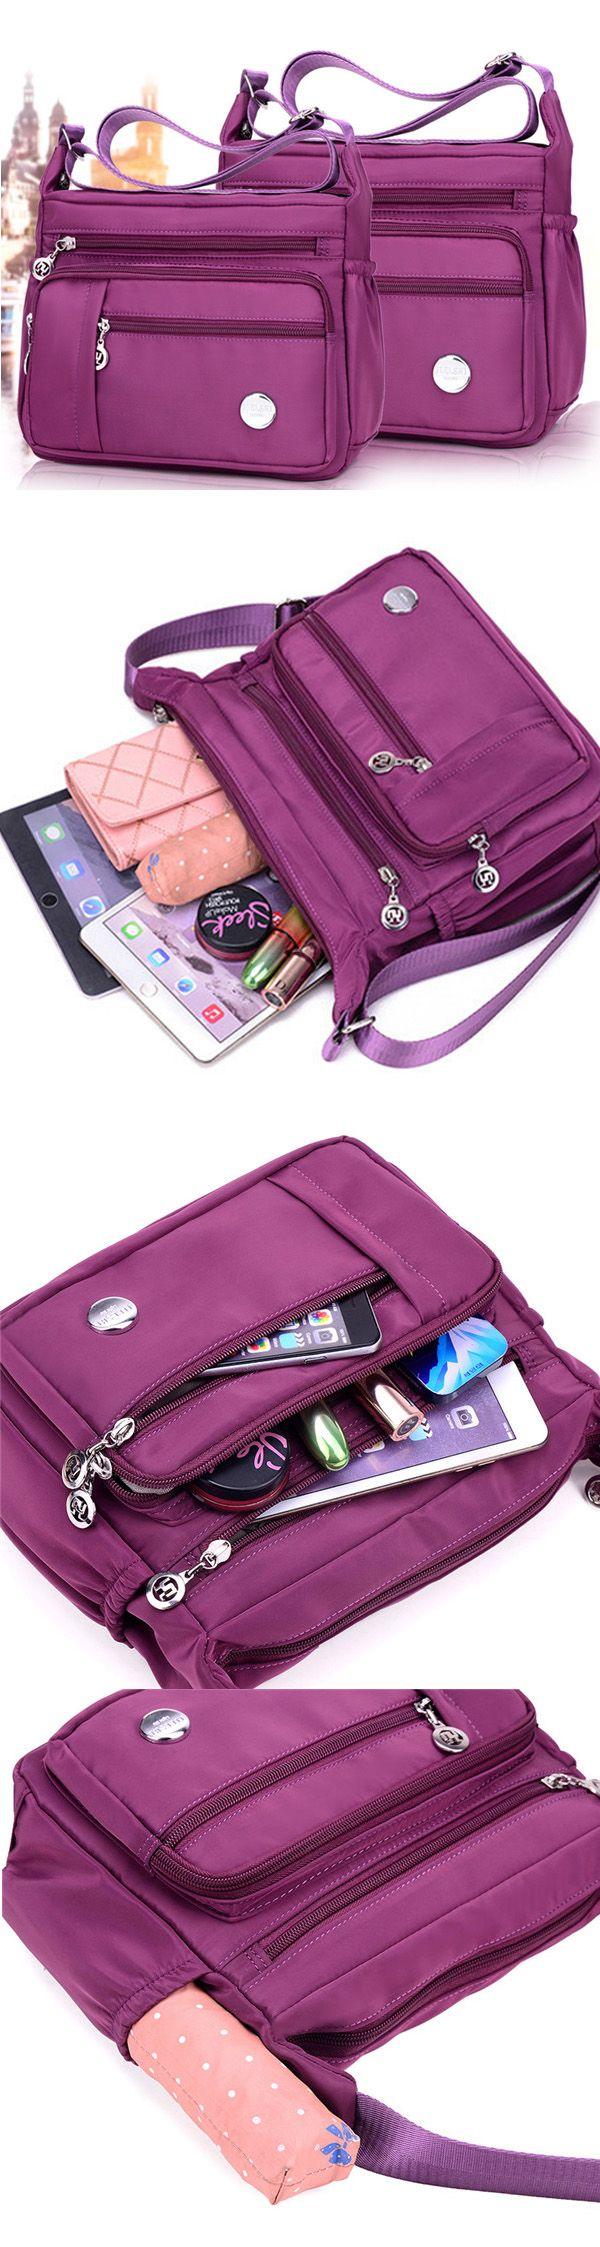 US$15.49  Women Waterproof Light Shoulder Bags Outdoor Sports Crossbody Bags Shoulder Bags